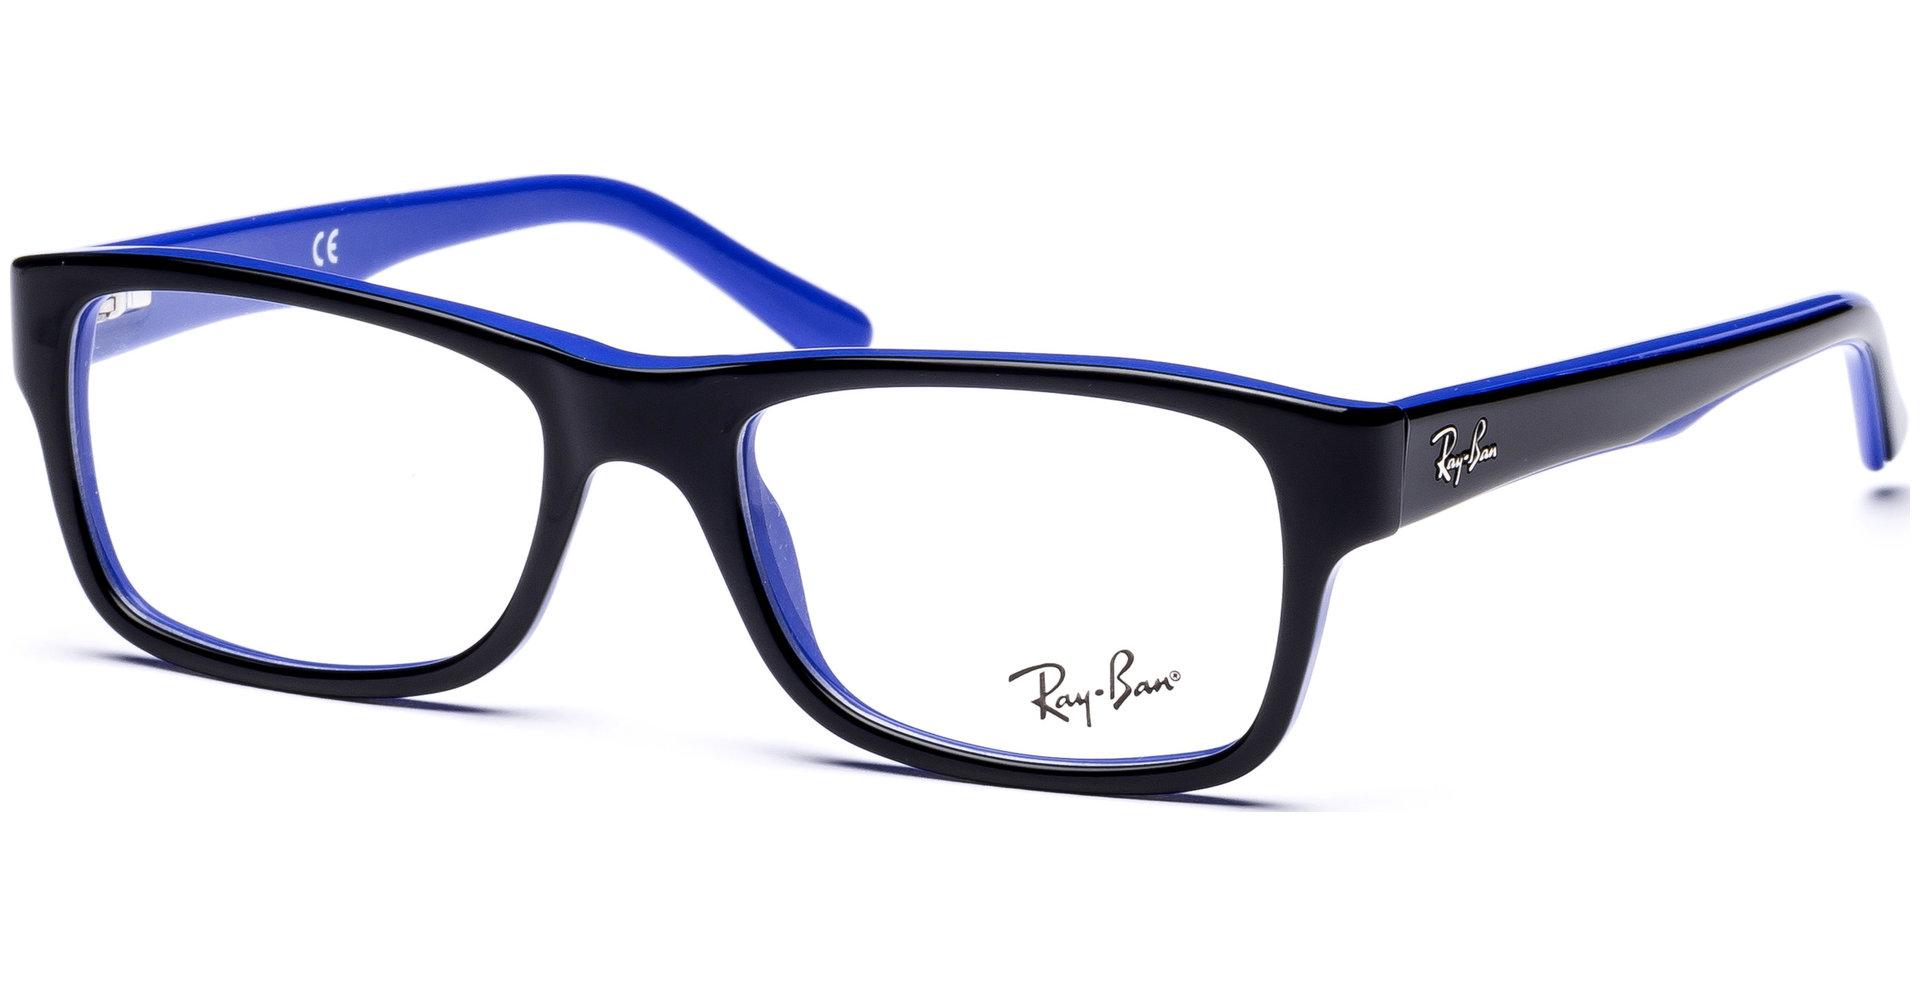 ray ban rx5268 5179 5017 top black on blue von netzoptiker. Black Bedroom Furniture Sets. Home Design Ideas